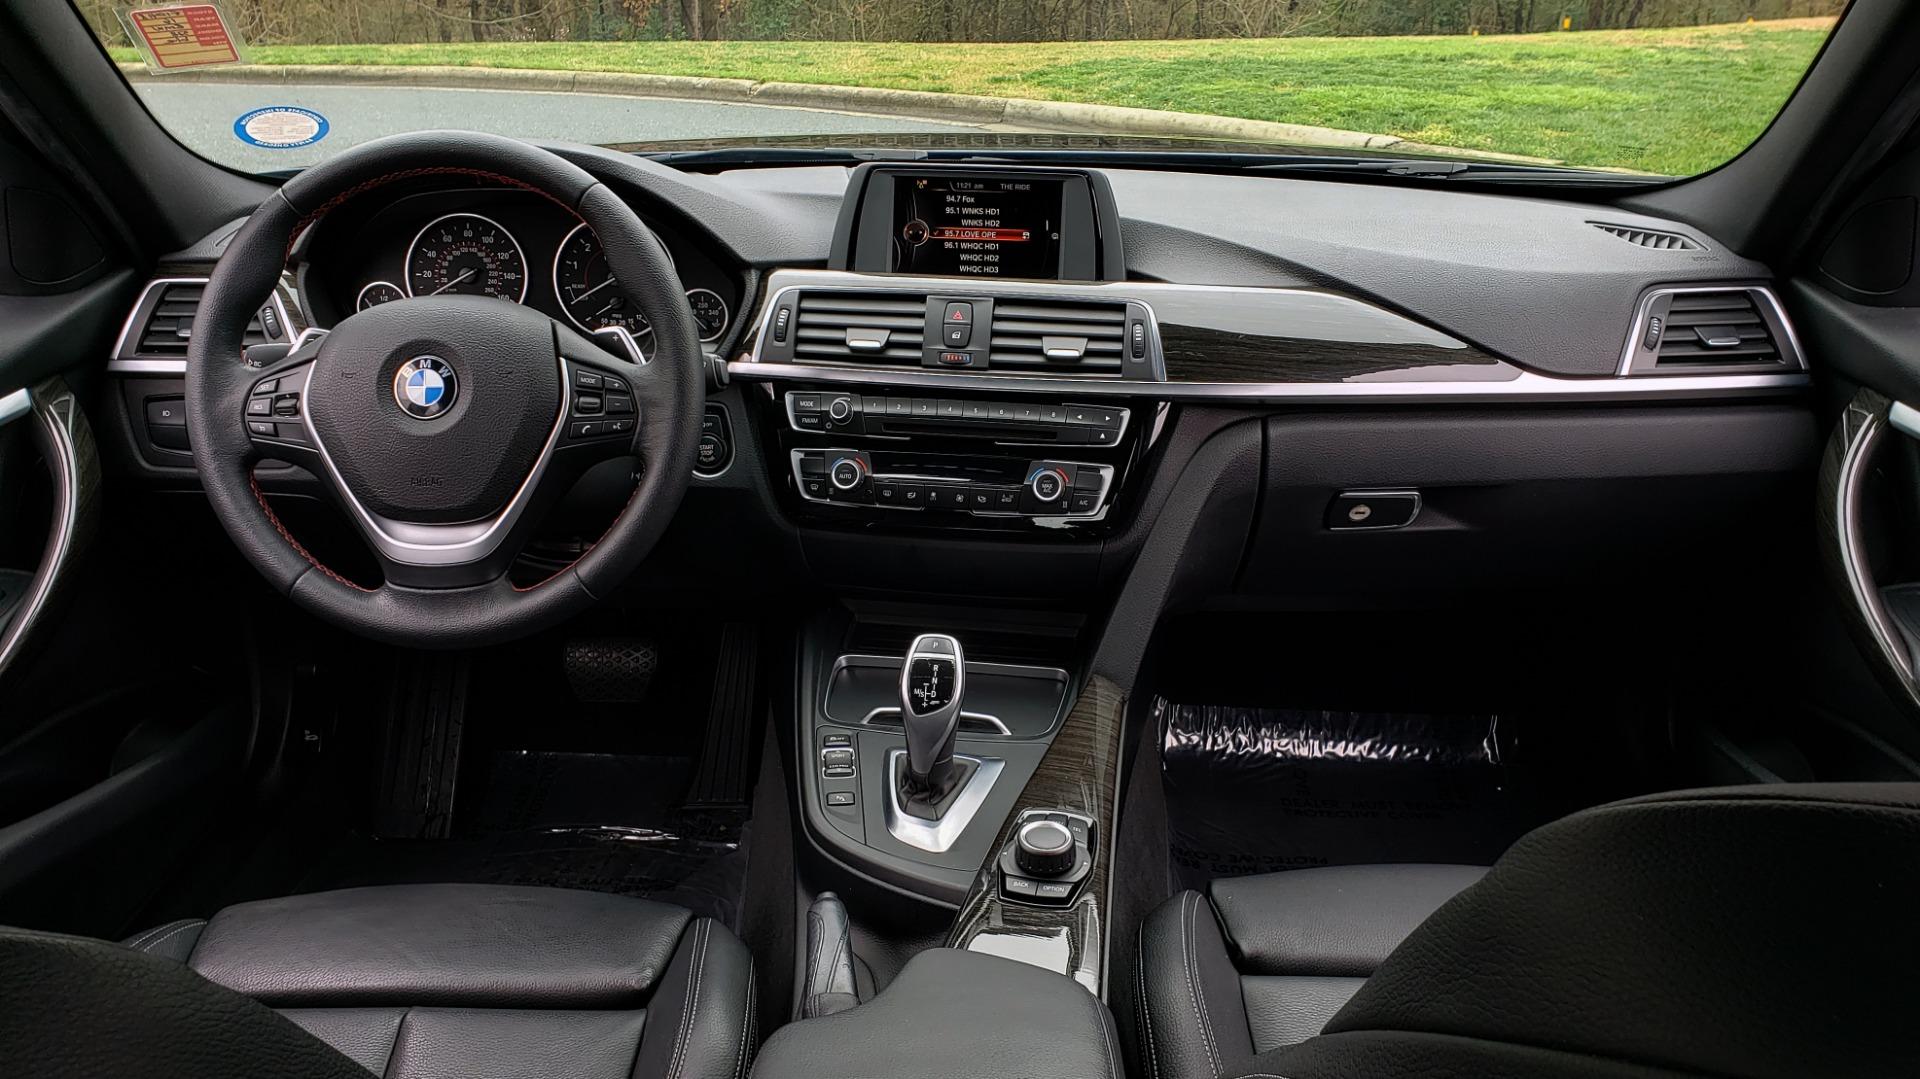 Used 2016 BMW 3 SERIES 328I PREMIUM PKG / DRVR ASST / SUNROOF / PARK ASST for sale Sold at Formula Imports in Charlotte NC 28227 71